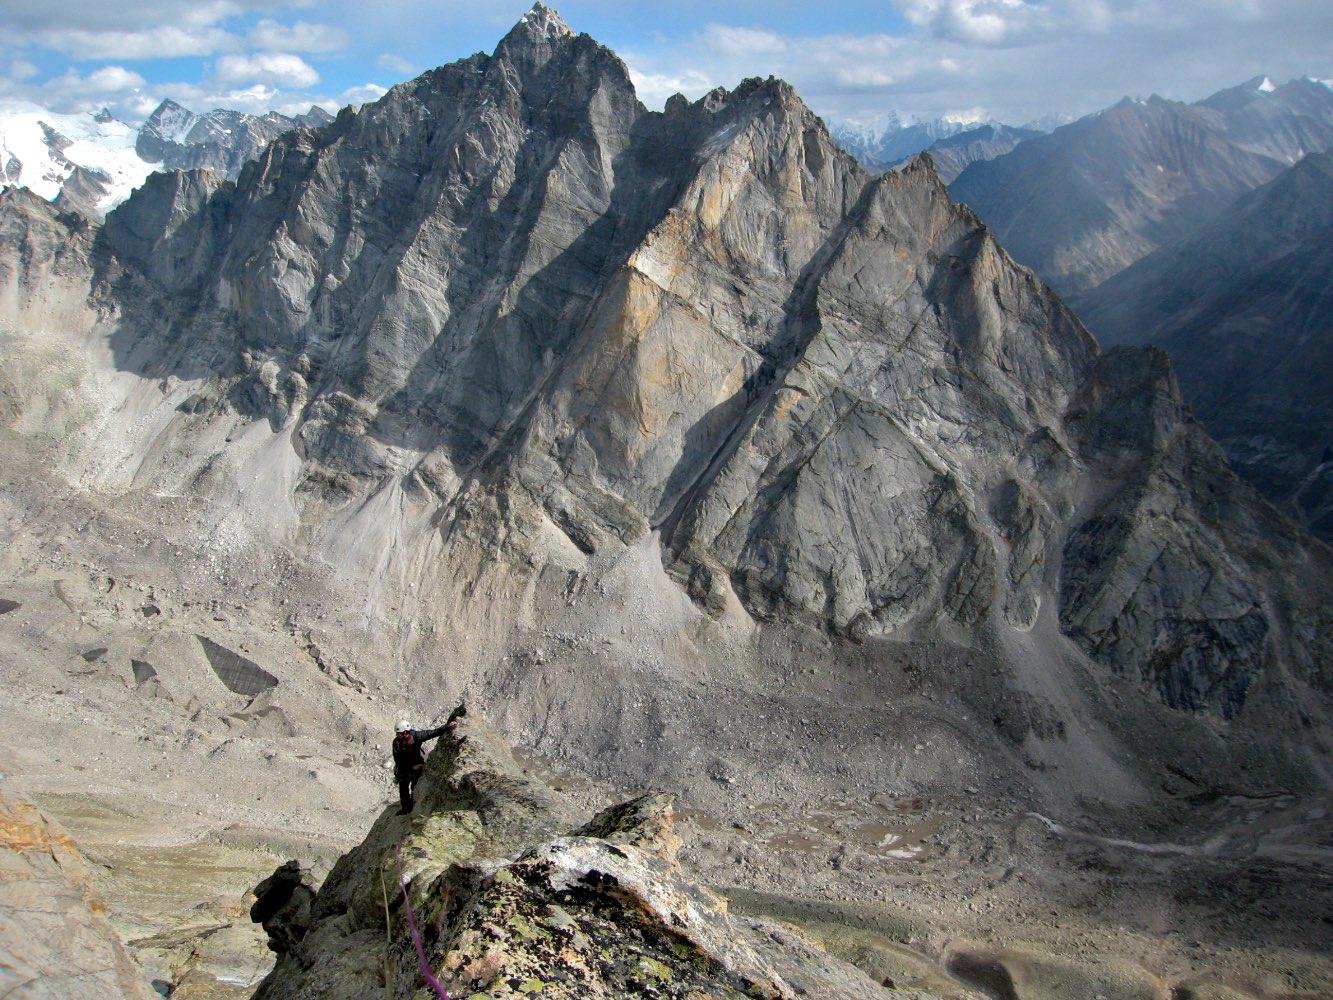 Summit ridge of Nazomi Peak